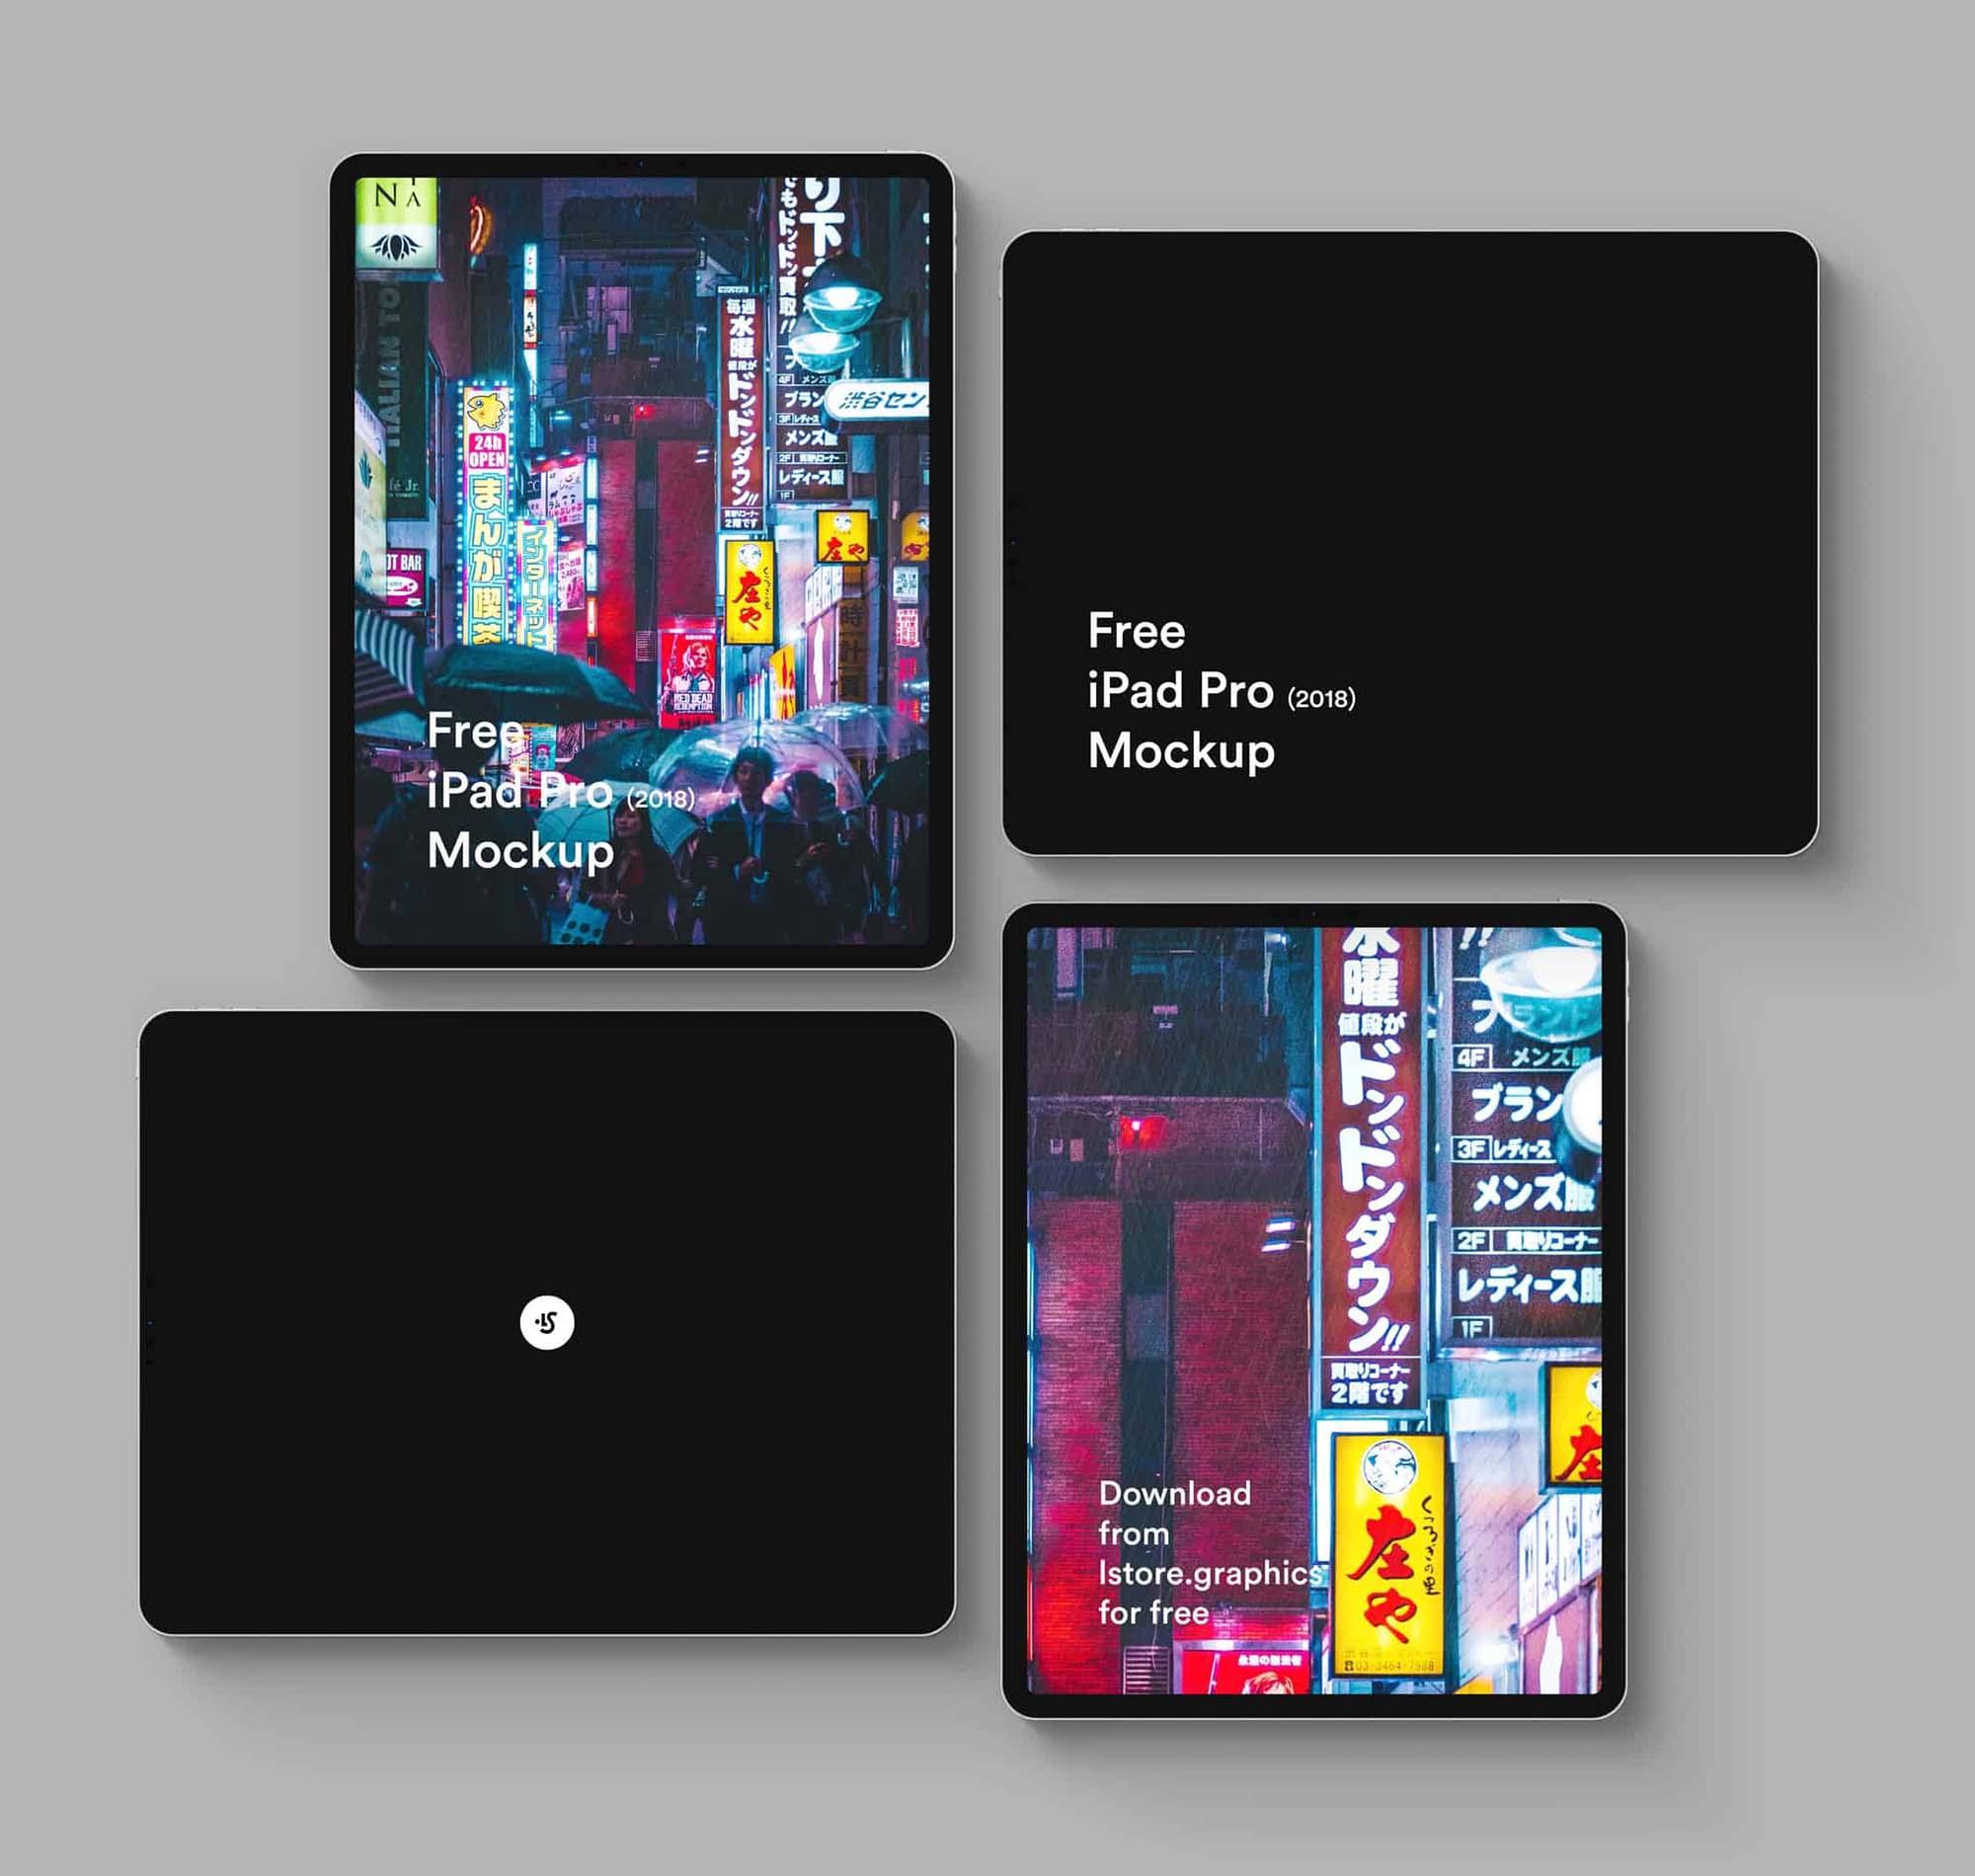 iPad Pro 2018 Mockup 2